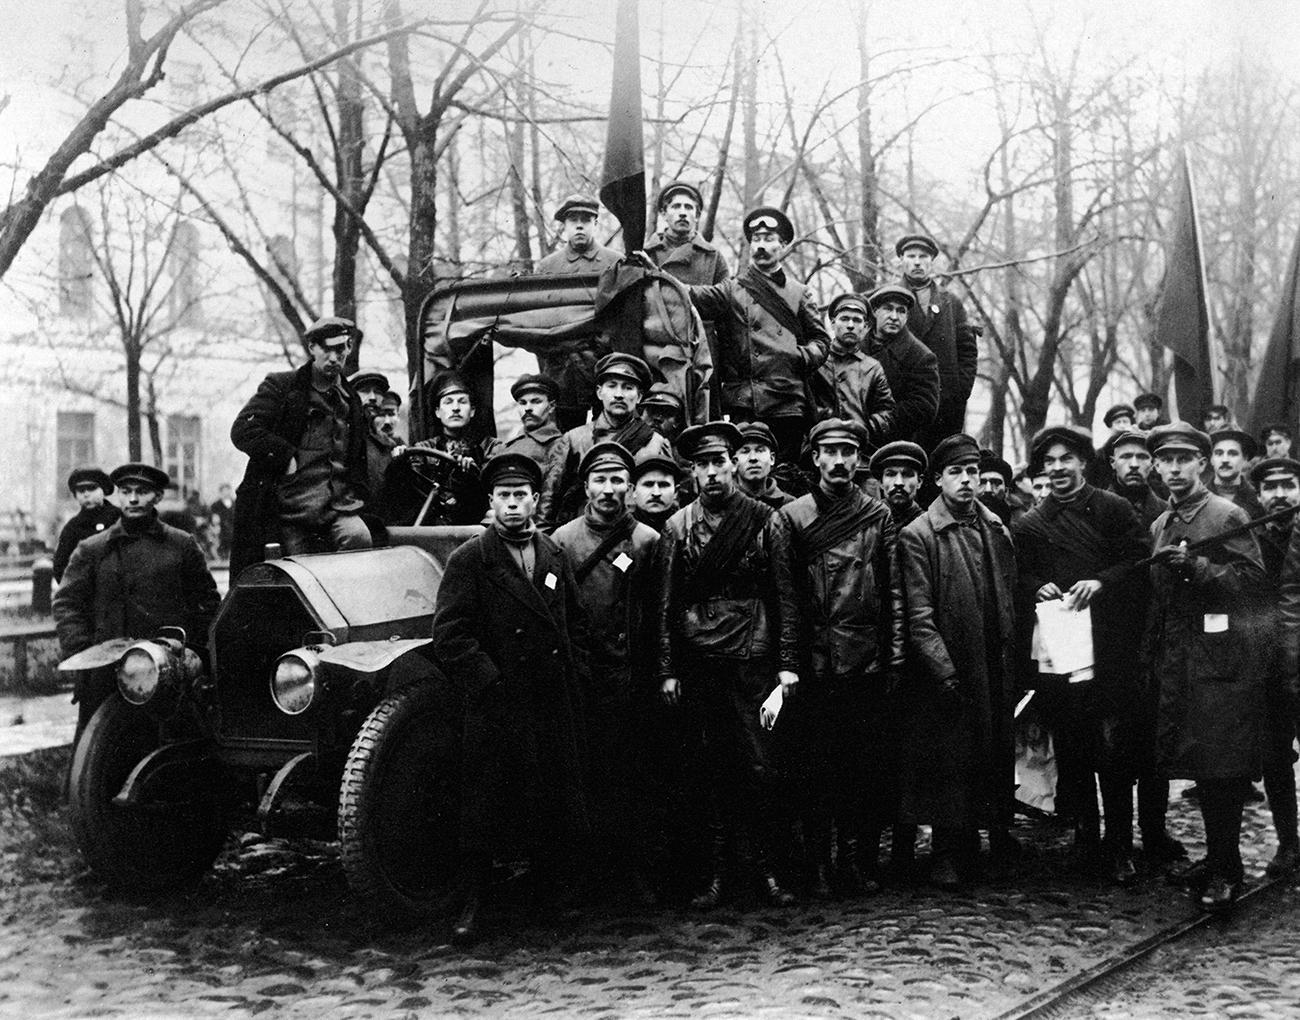 Russia's Year Zero: The true story behind the Bolshevik Revolution of 1917